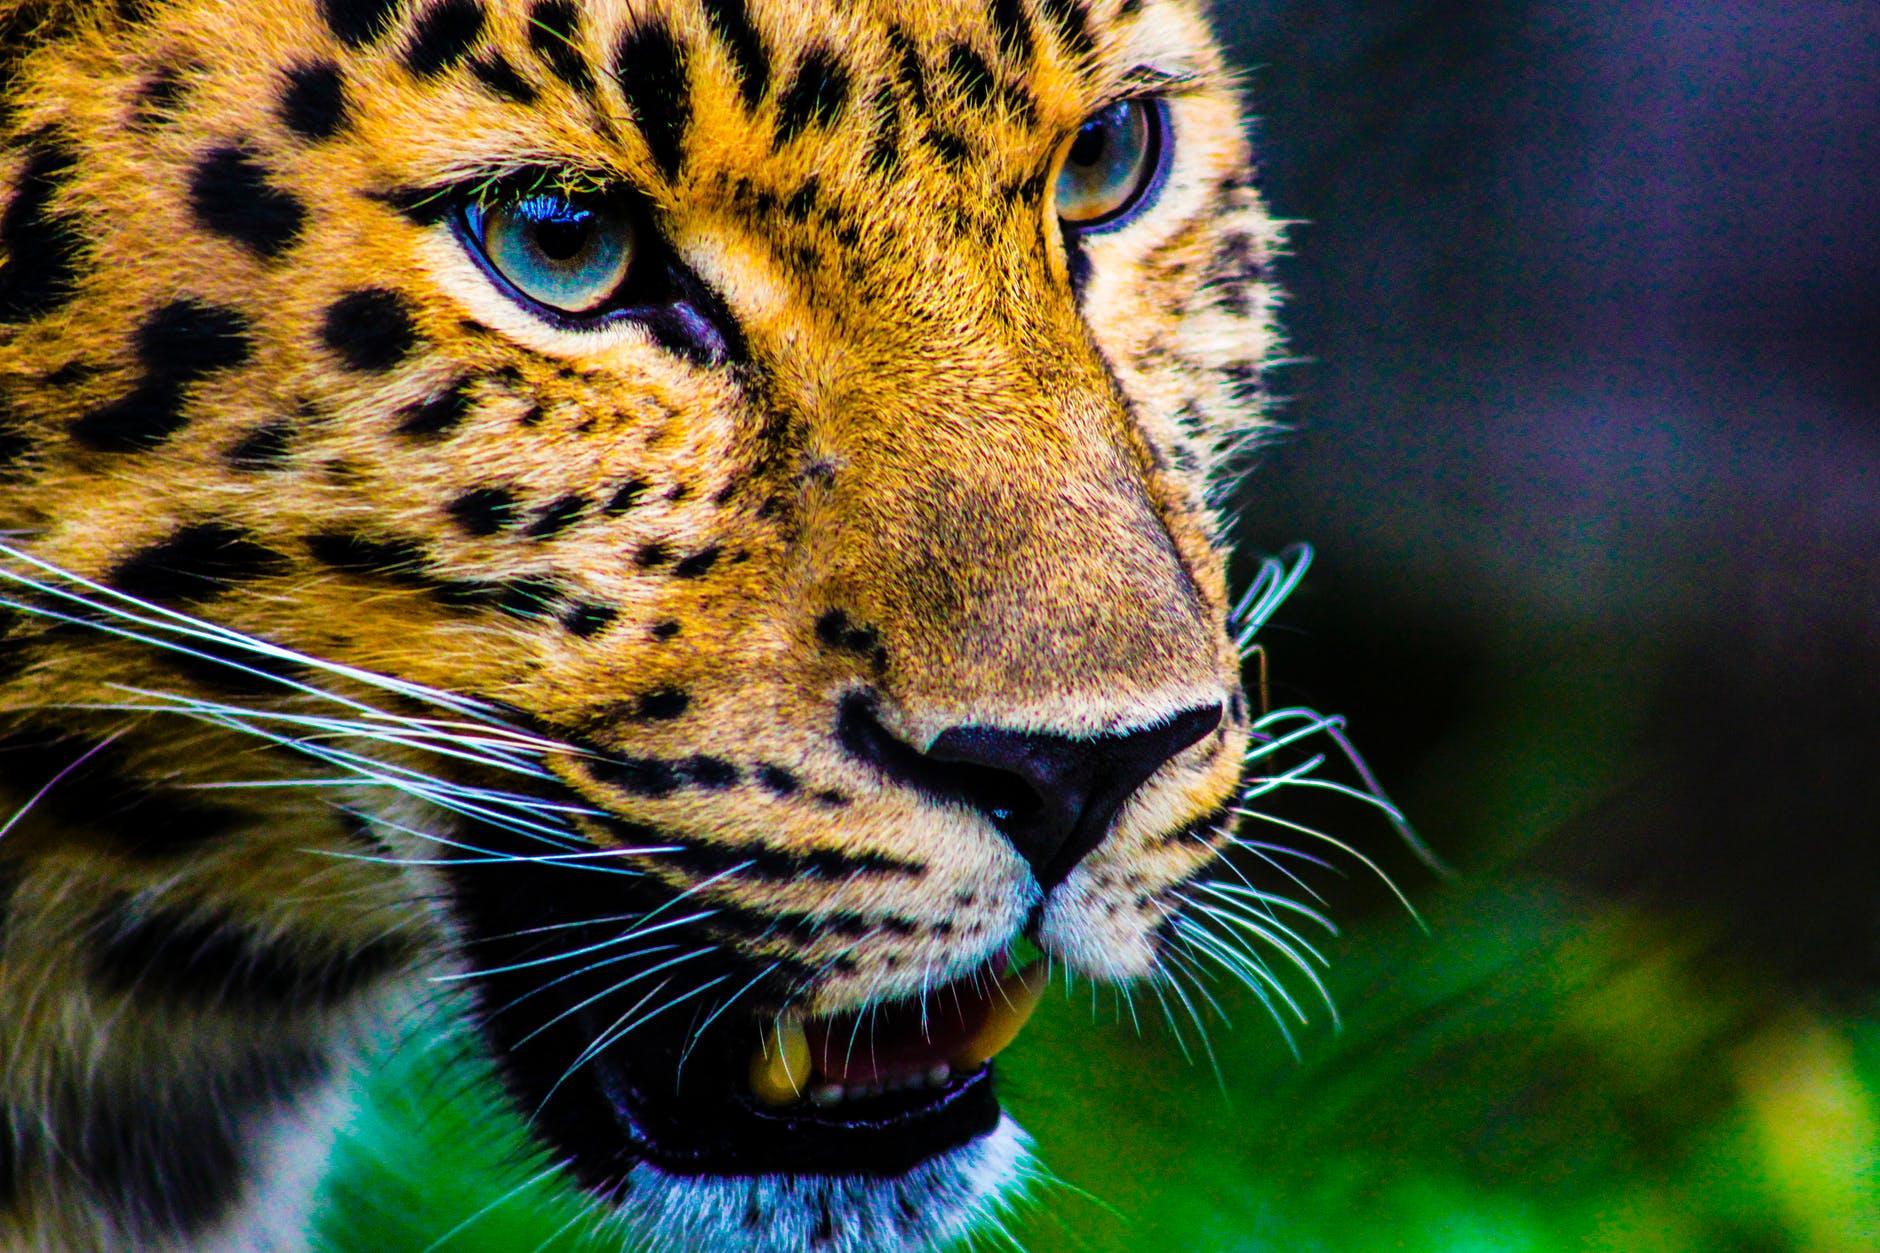 AES anuncia iniciativa para preservar el jaguar en México